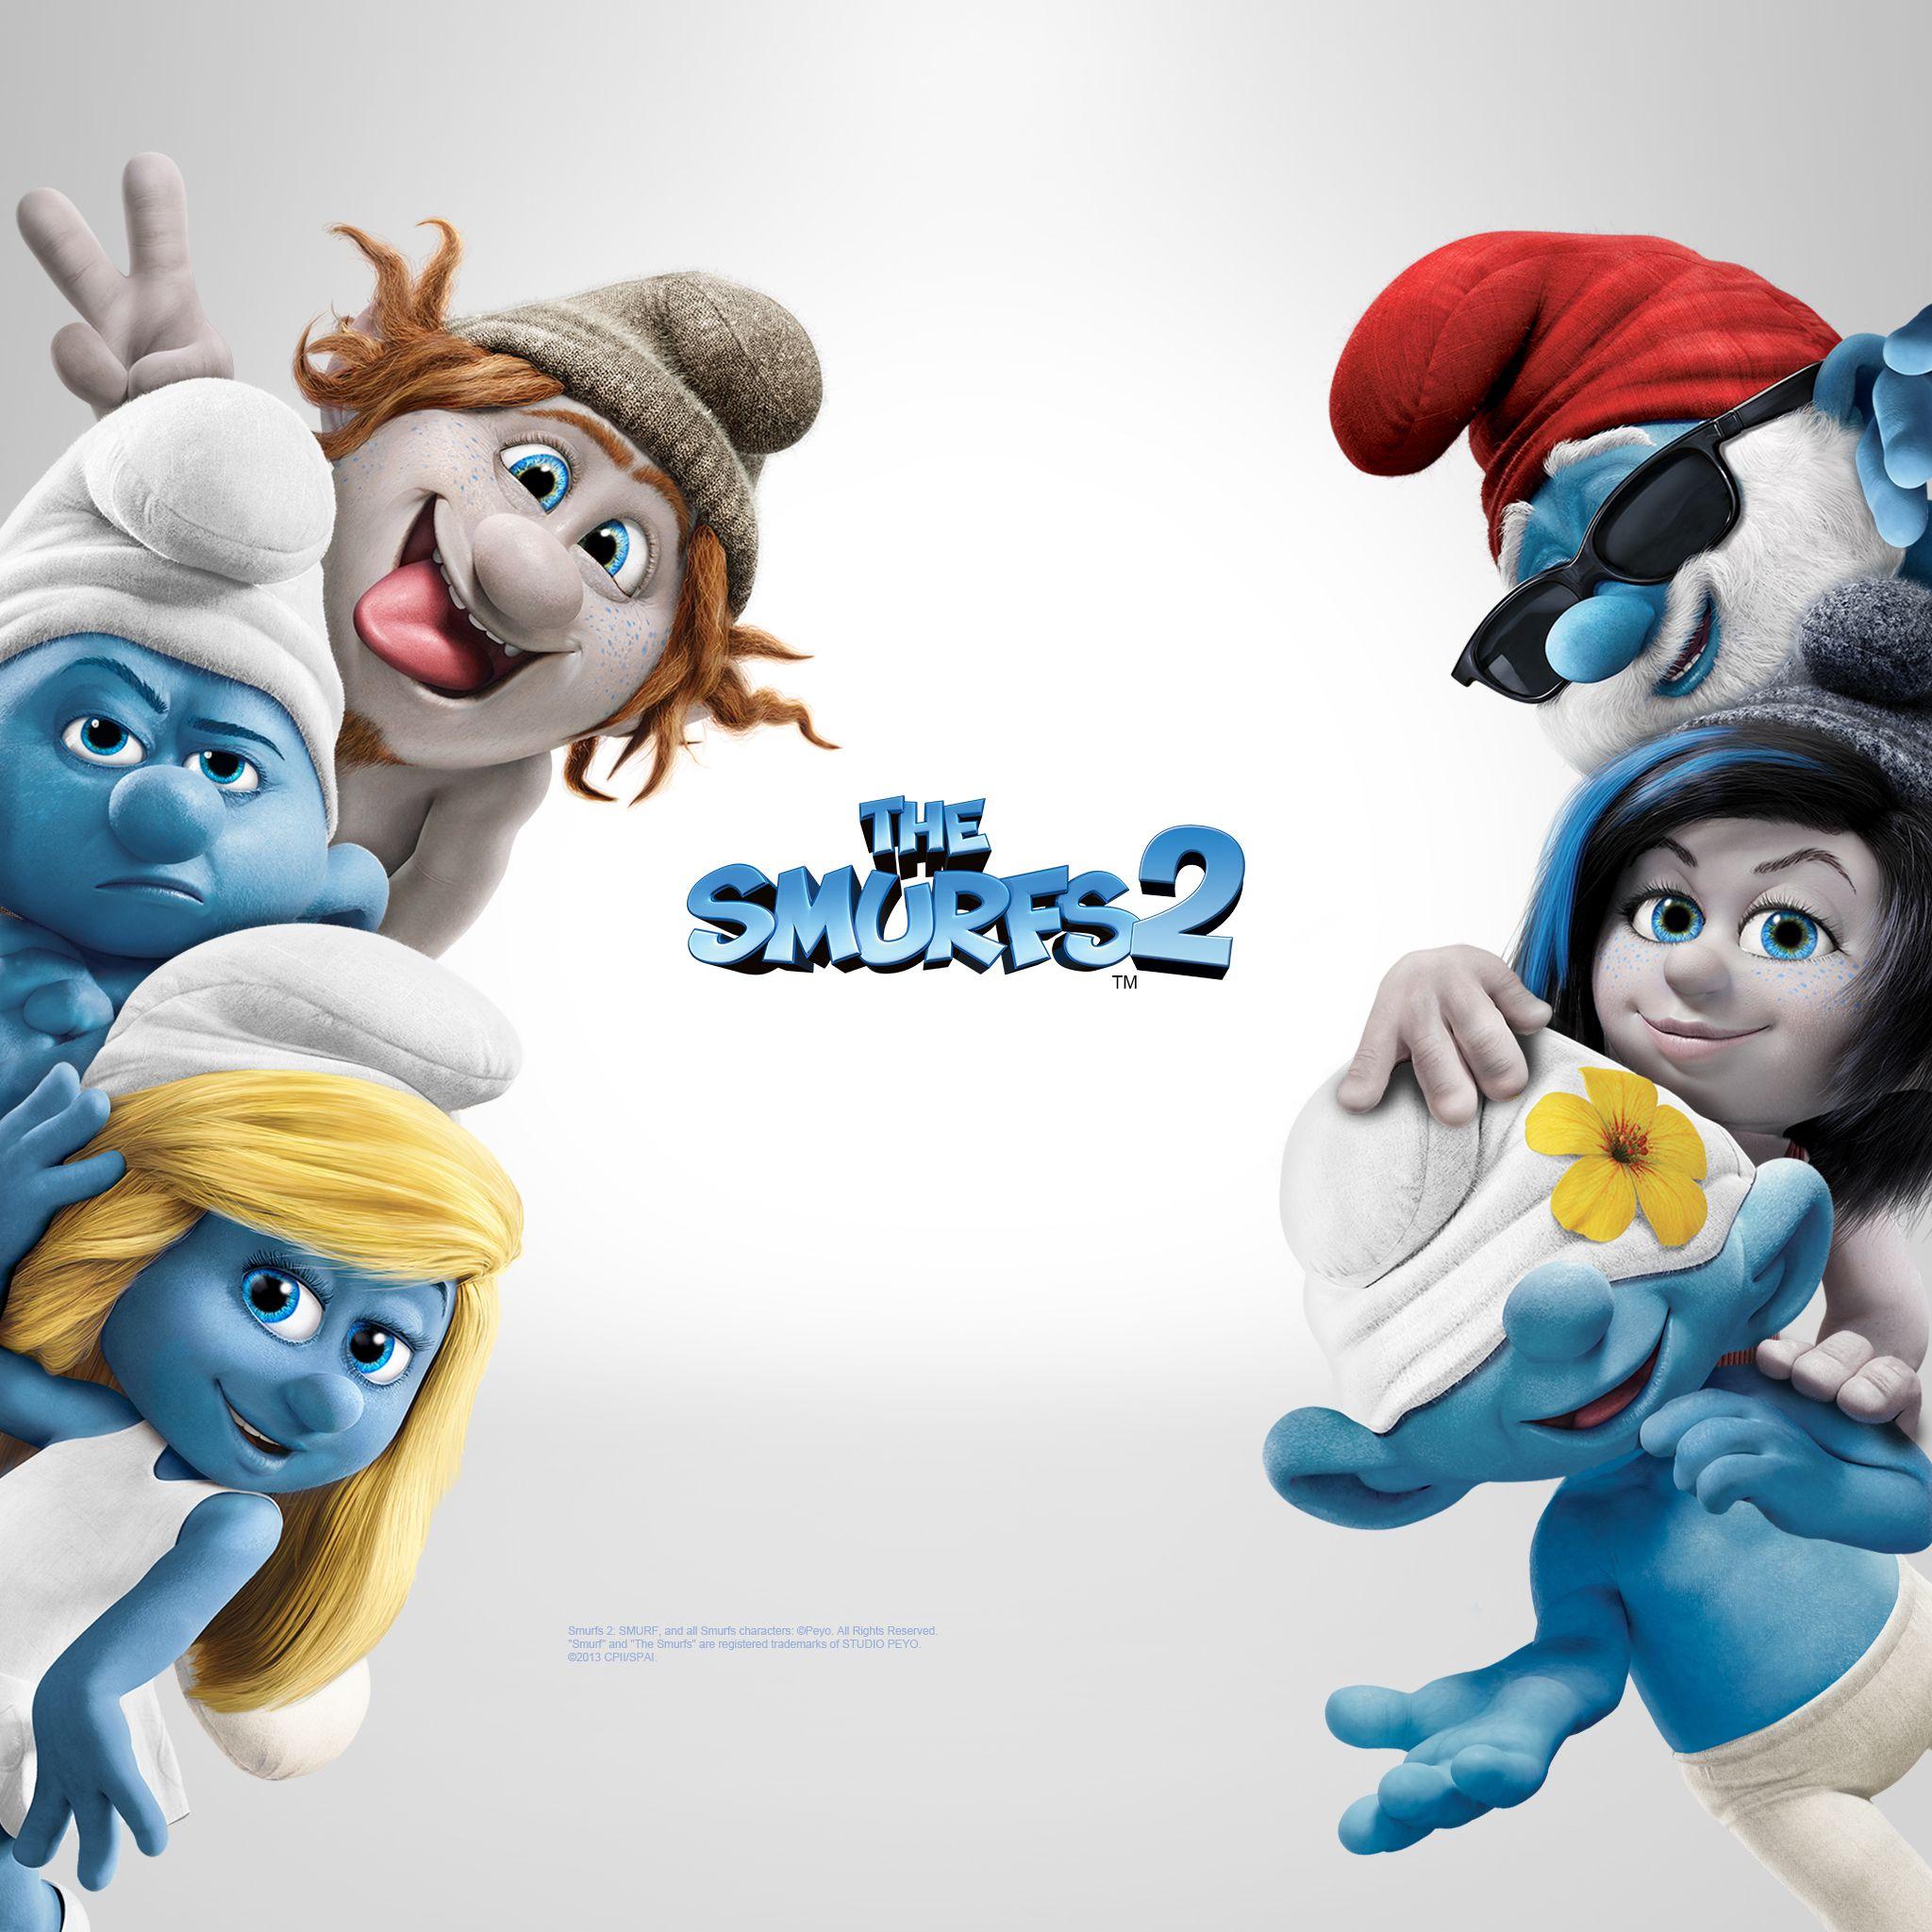 The Smurfs 2 (2013) Wallpapers, Facebook Cover Photos